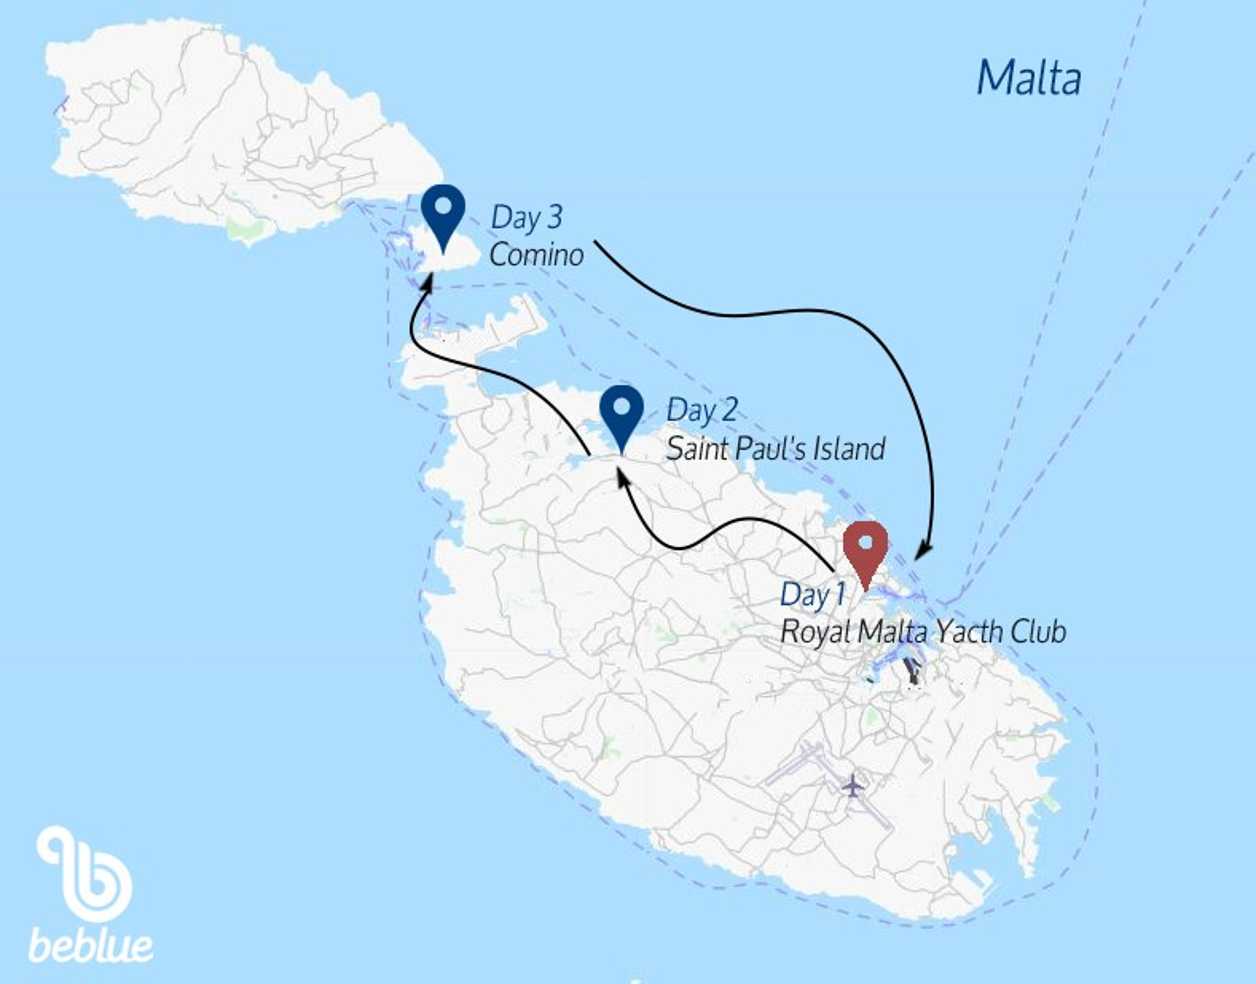 40 BeWeekend - Catamaran Trip to Malta